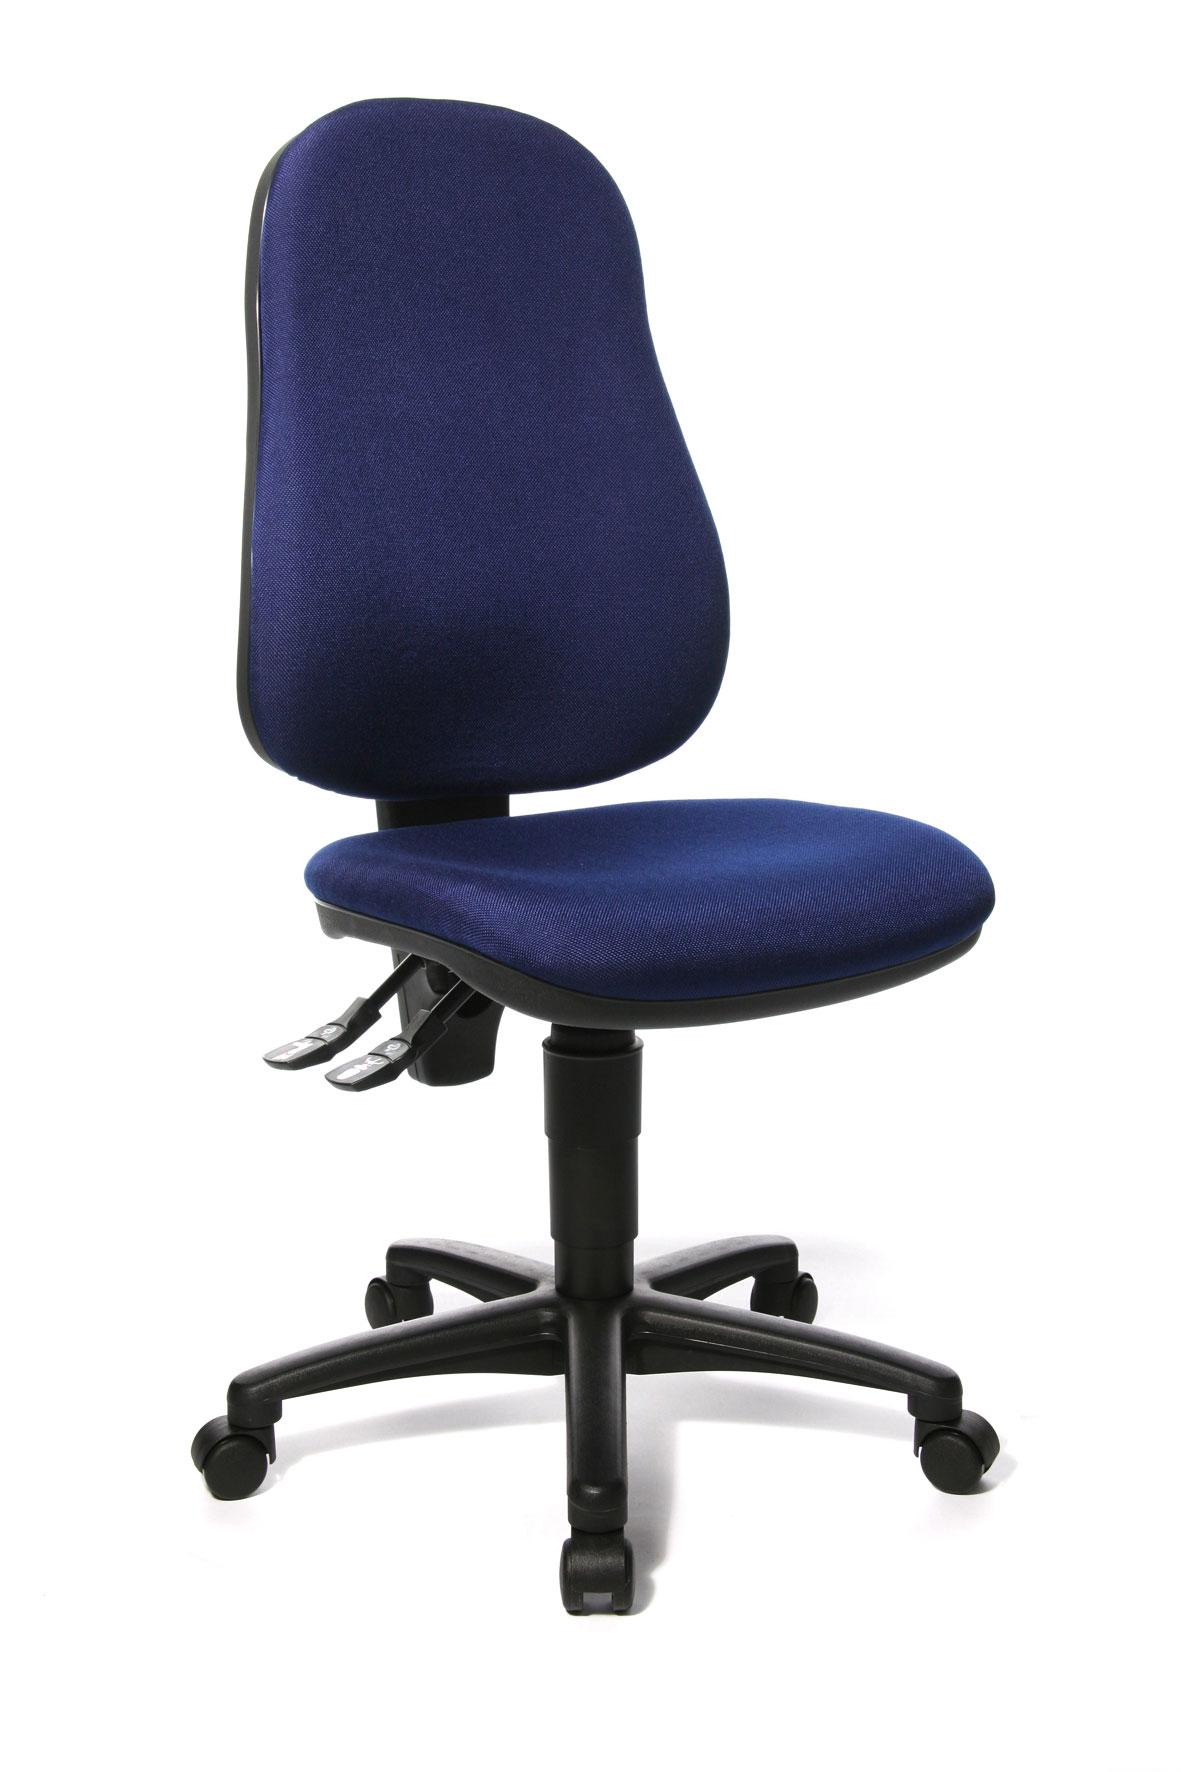 Chaise de bureau contemporaine en tissu bleu Baleares